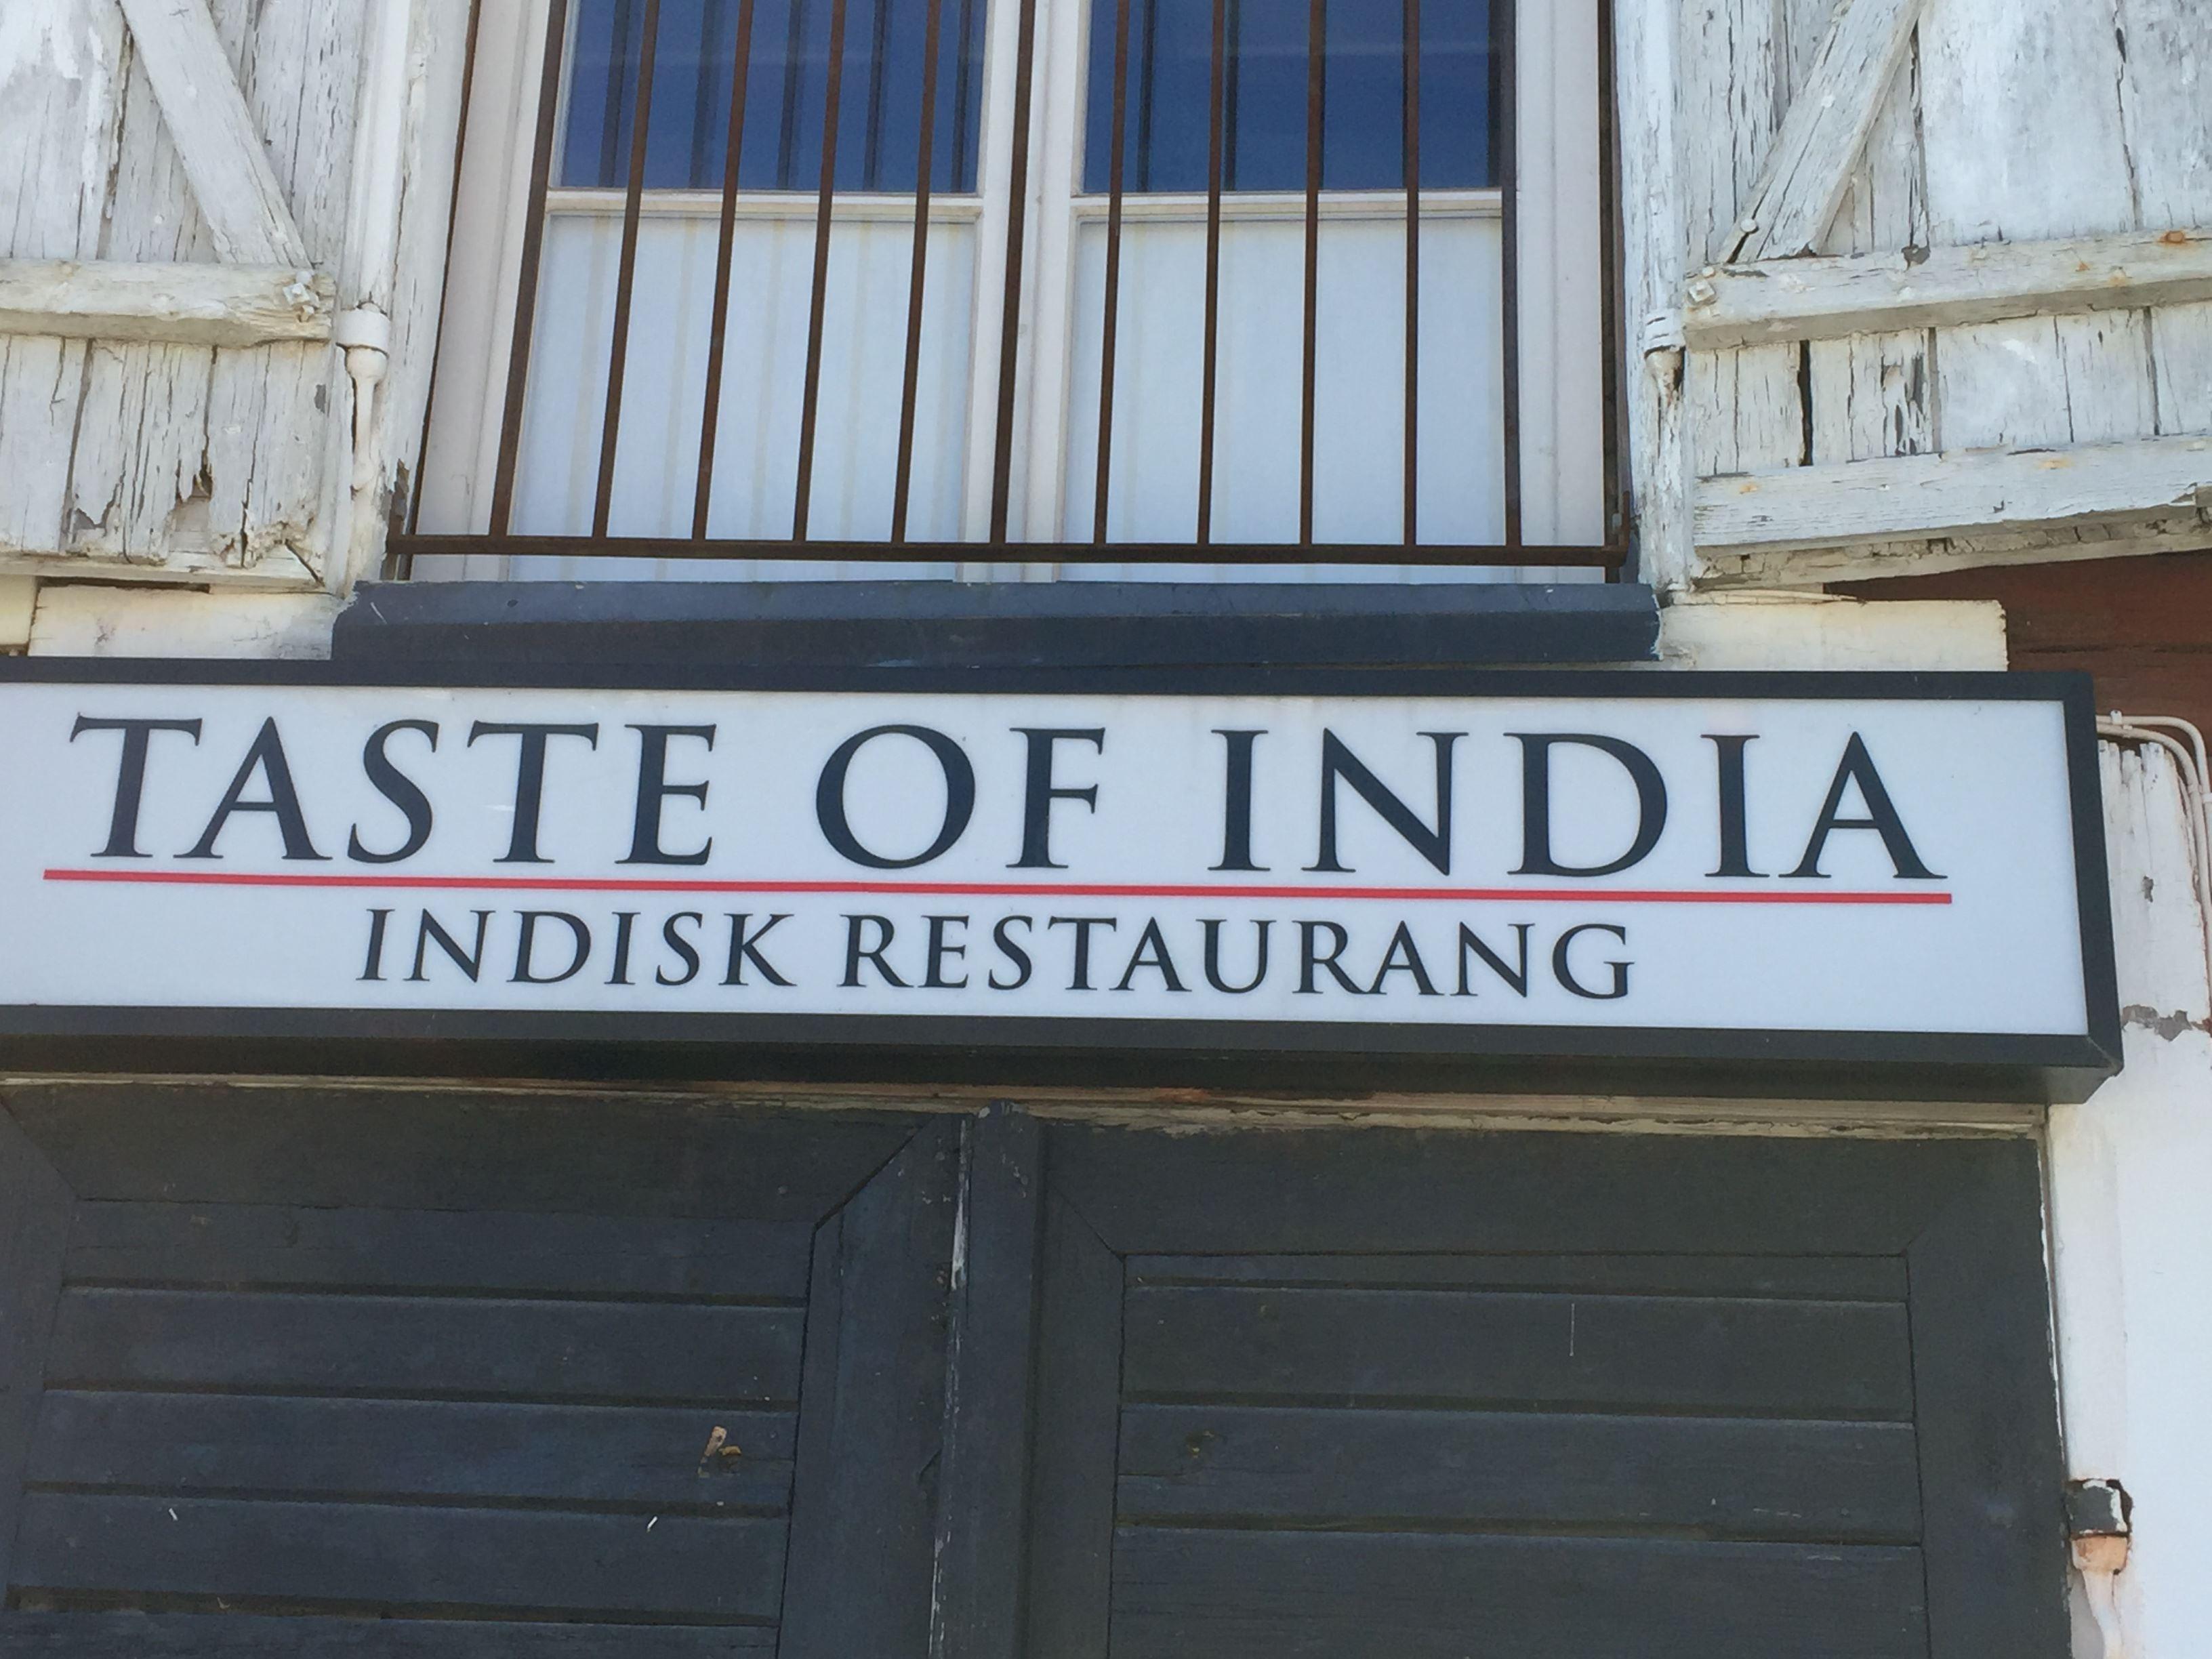 Taste of India - Sea Street Sushi Bar